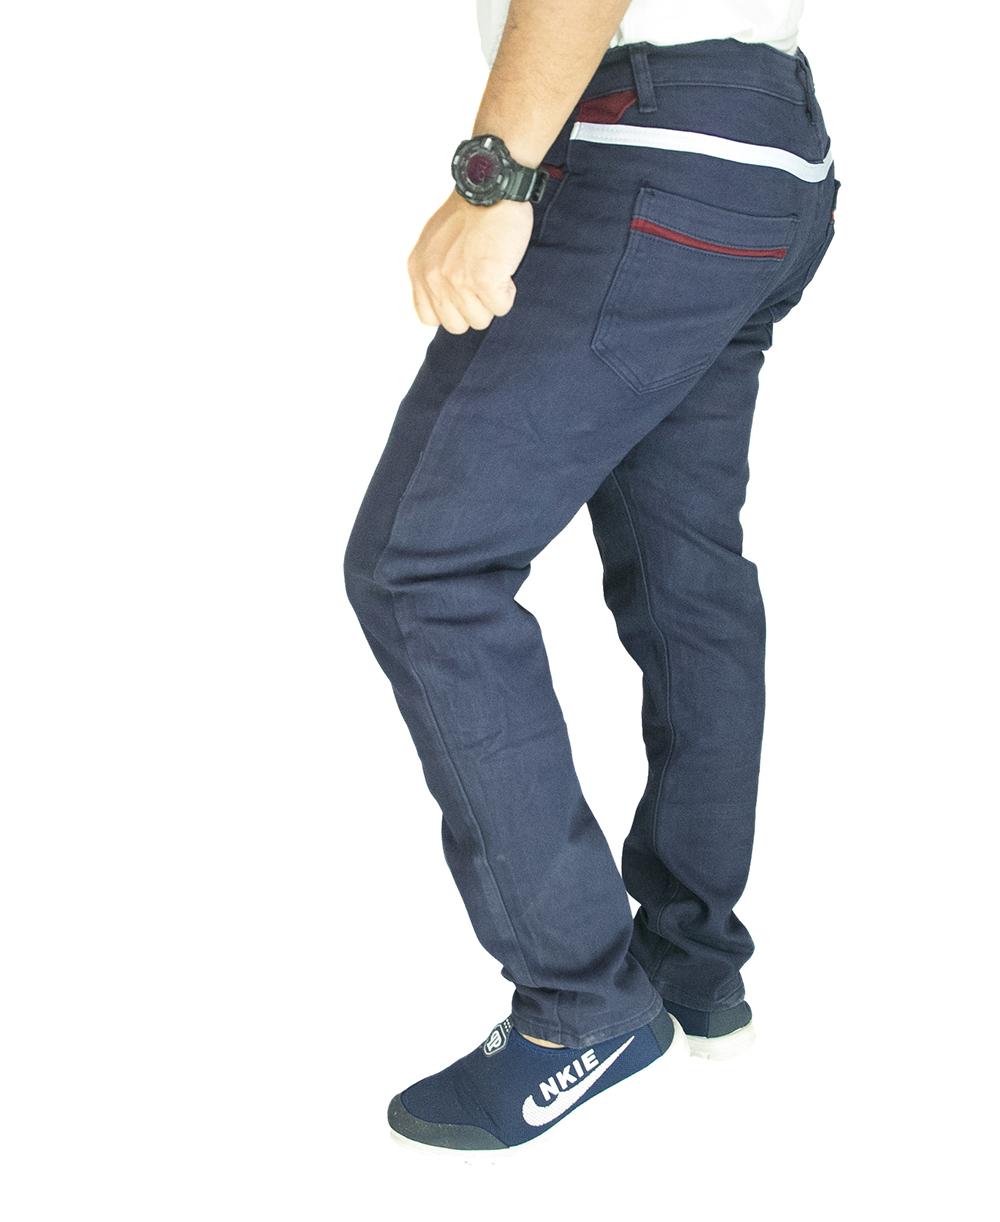 CY  2551 [ BLUE ] CASUAL KPOP SLIM KOREA PANTS SELUAR PLUS SIZE BESAR COTTON